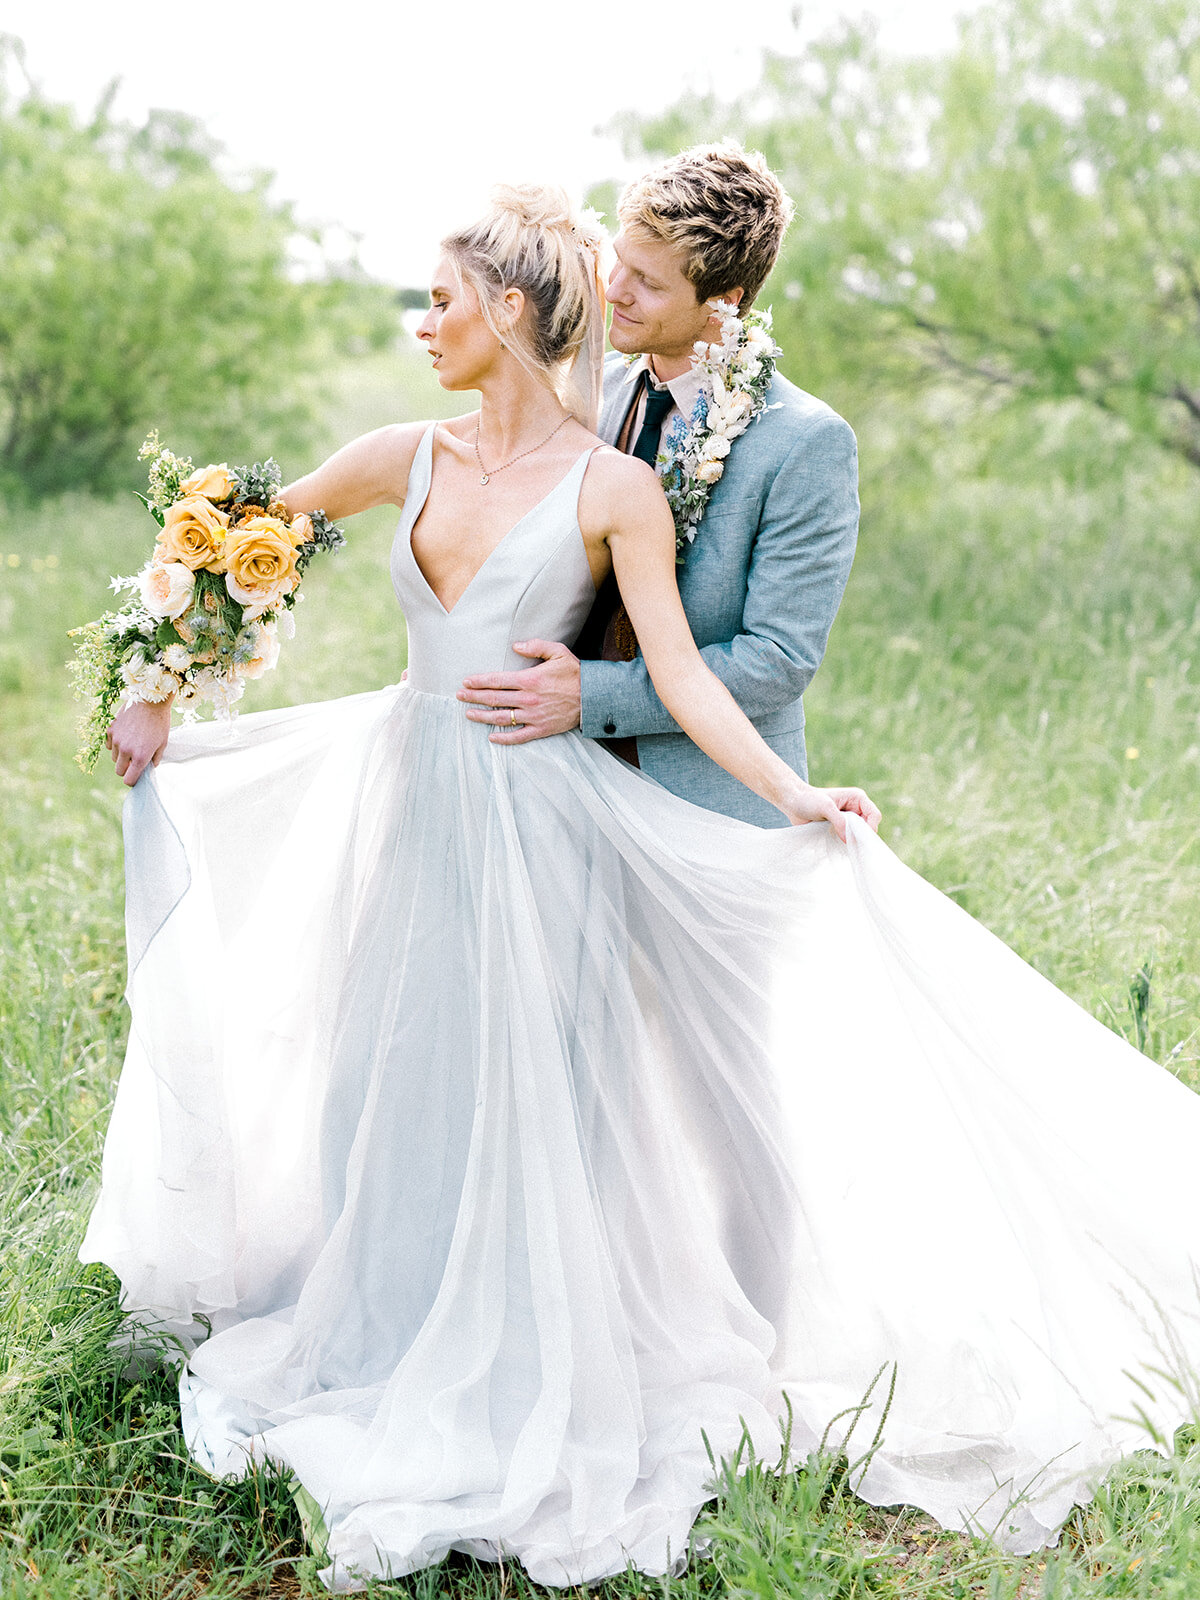 Elegant Country Theme Wedding Florals